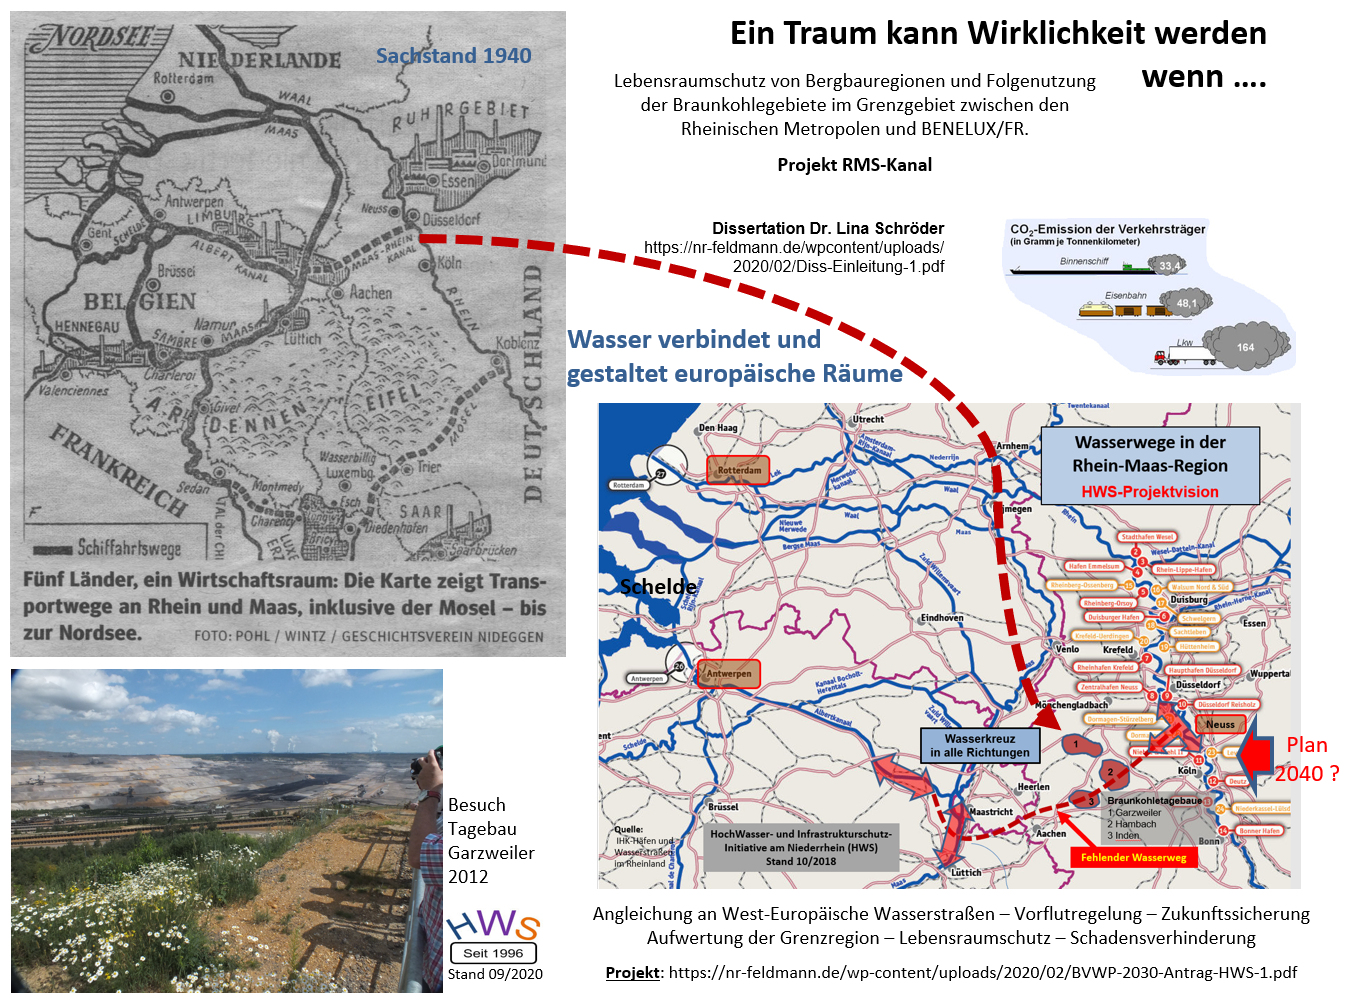 RMS-Kanal-Projekt